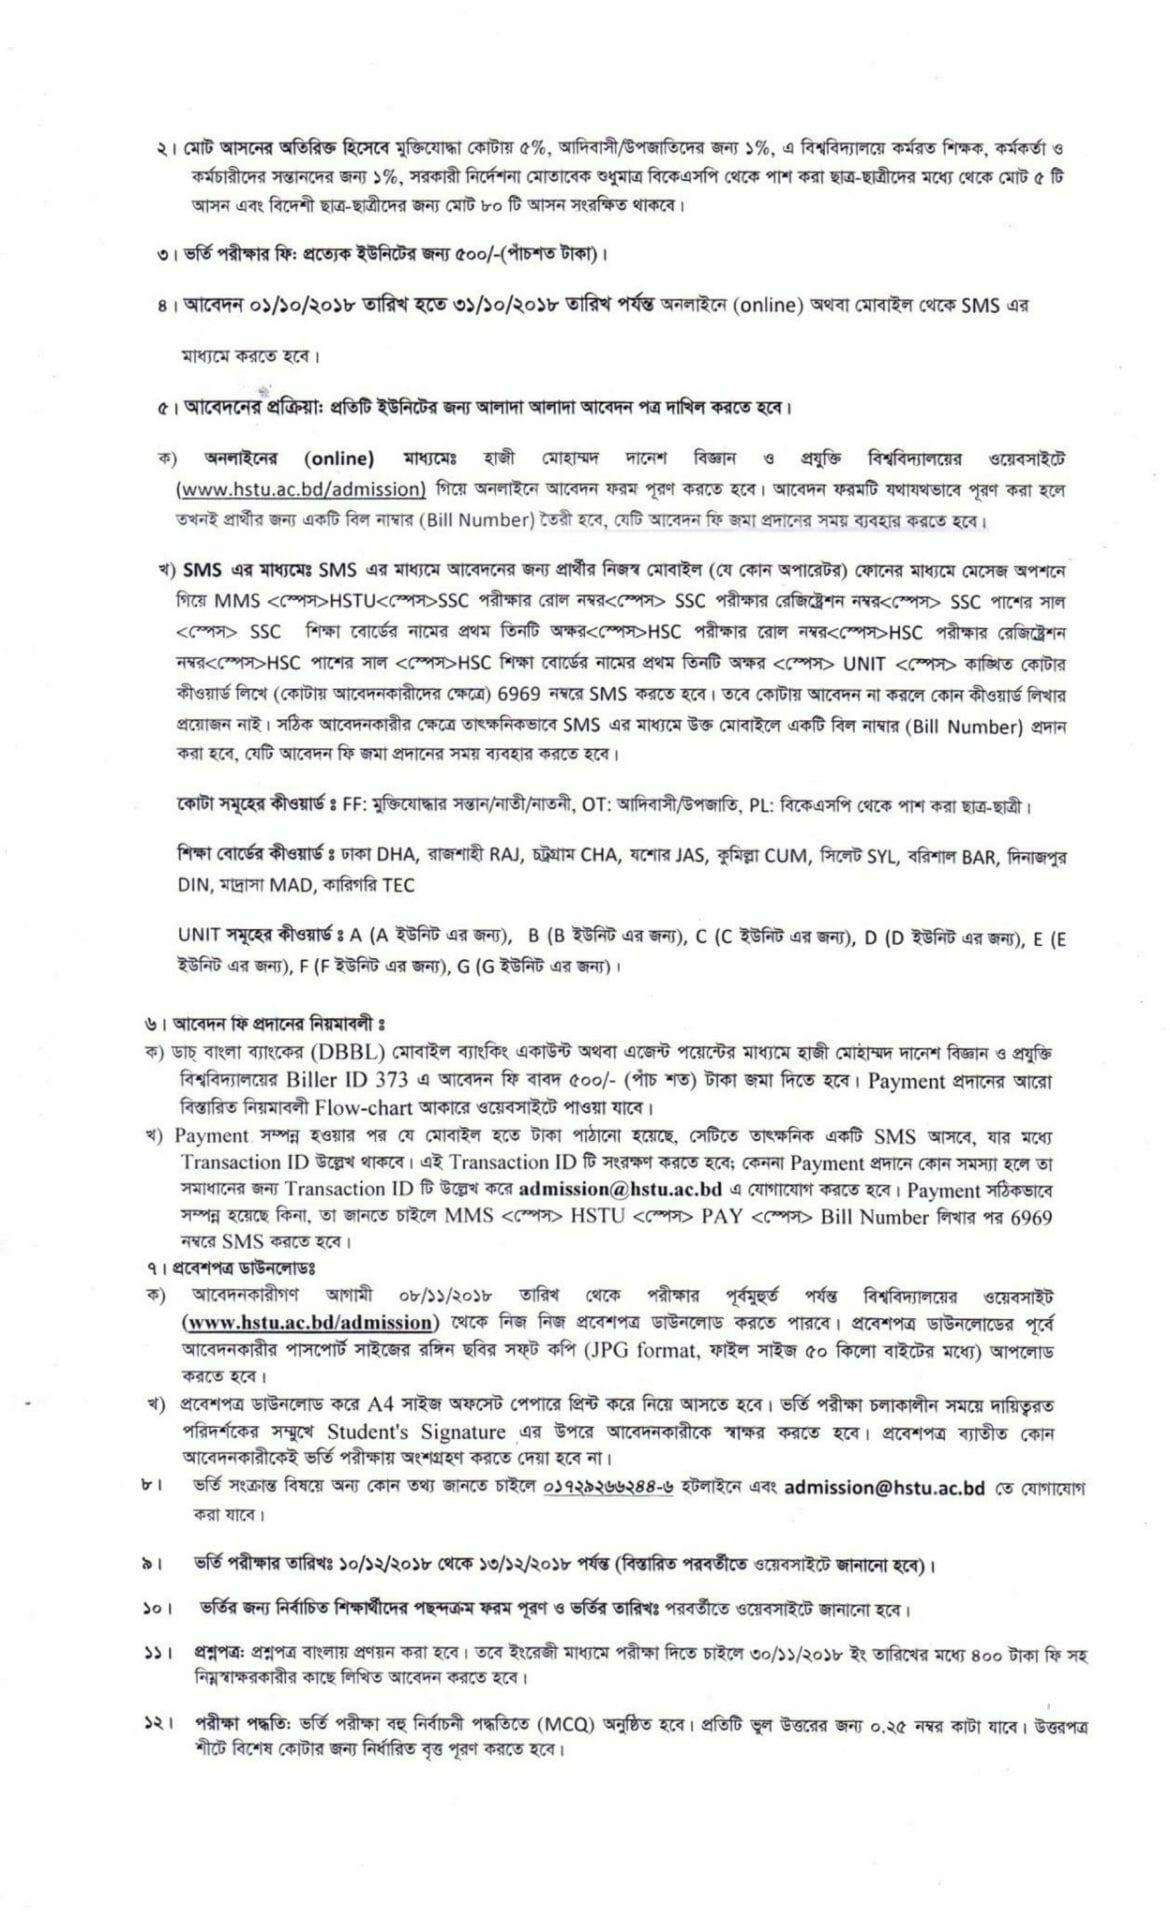 Hajee Mohammad Danesh Science & Technology University Admission Notice-2